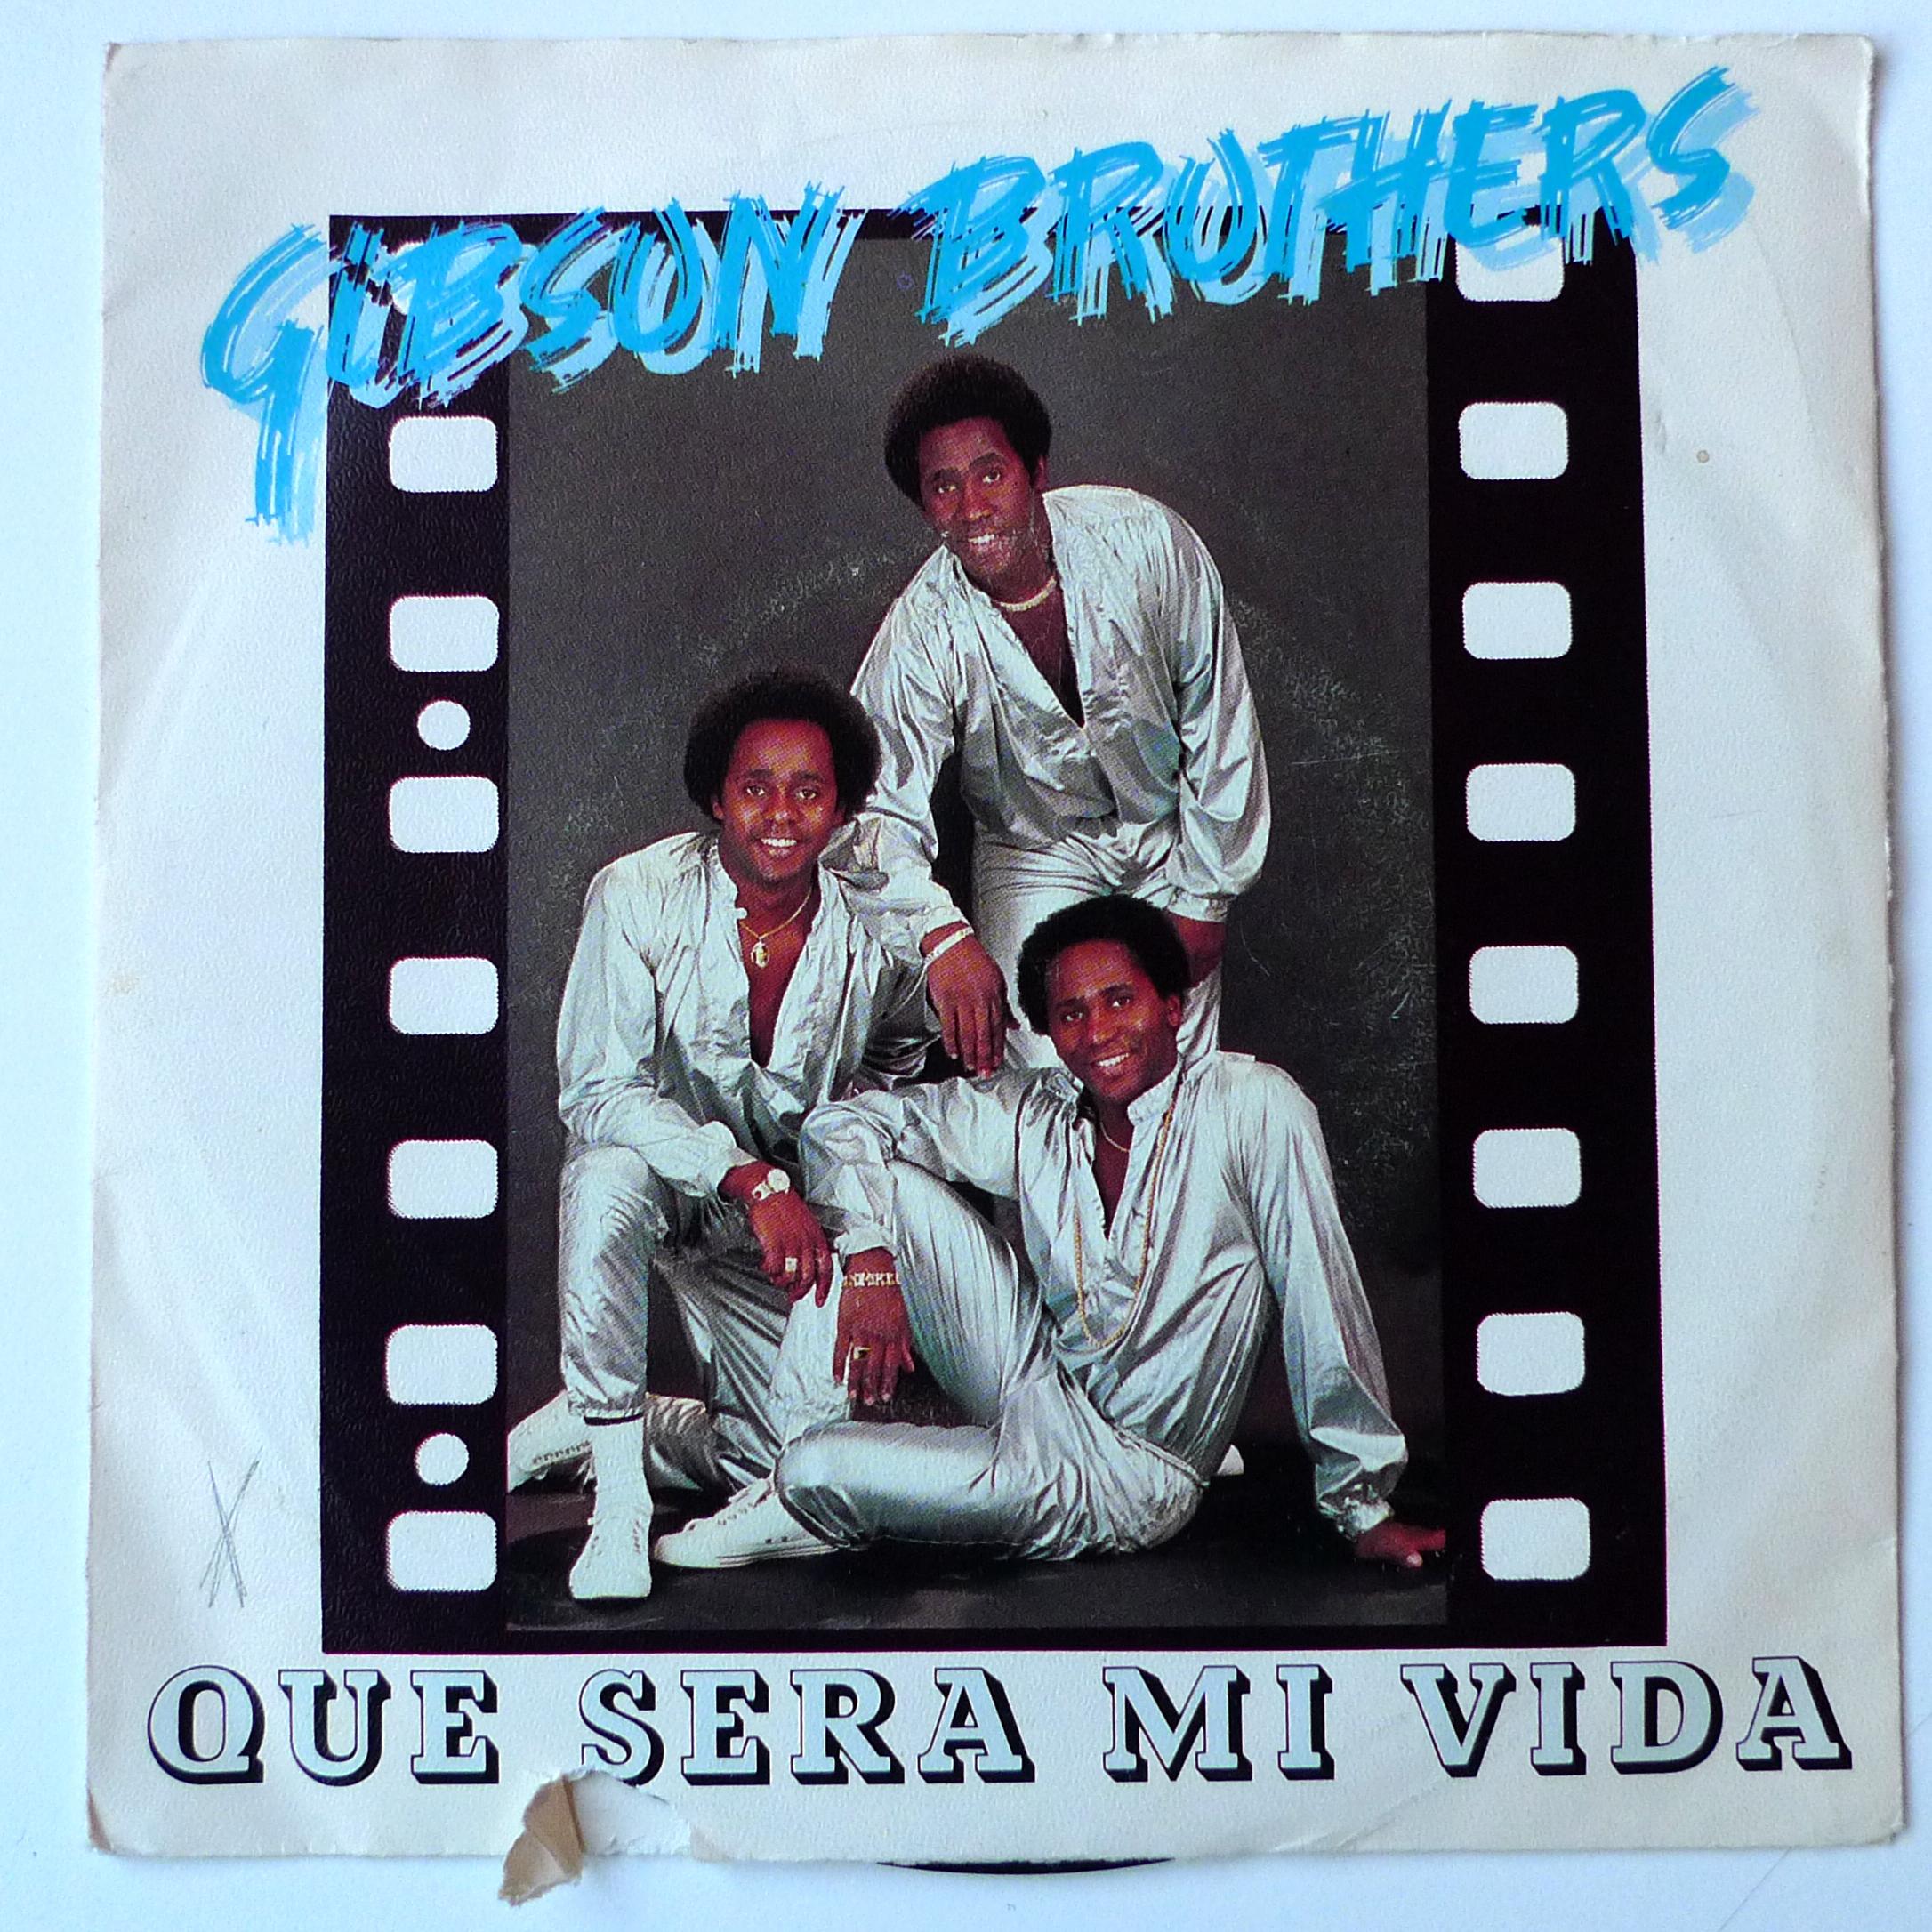 dj50s ep020 sleeve gibson brothers